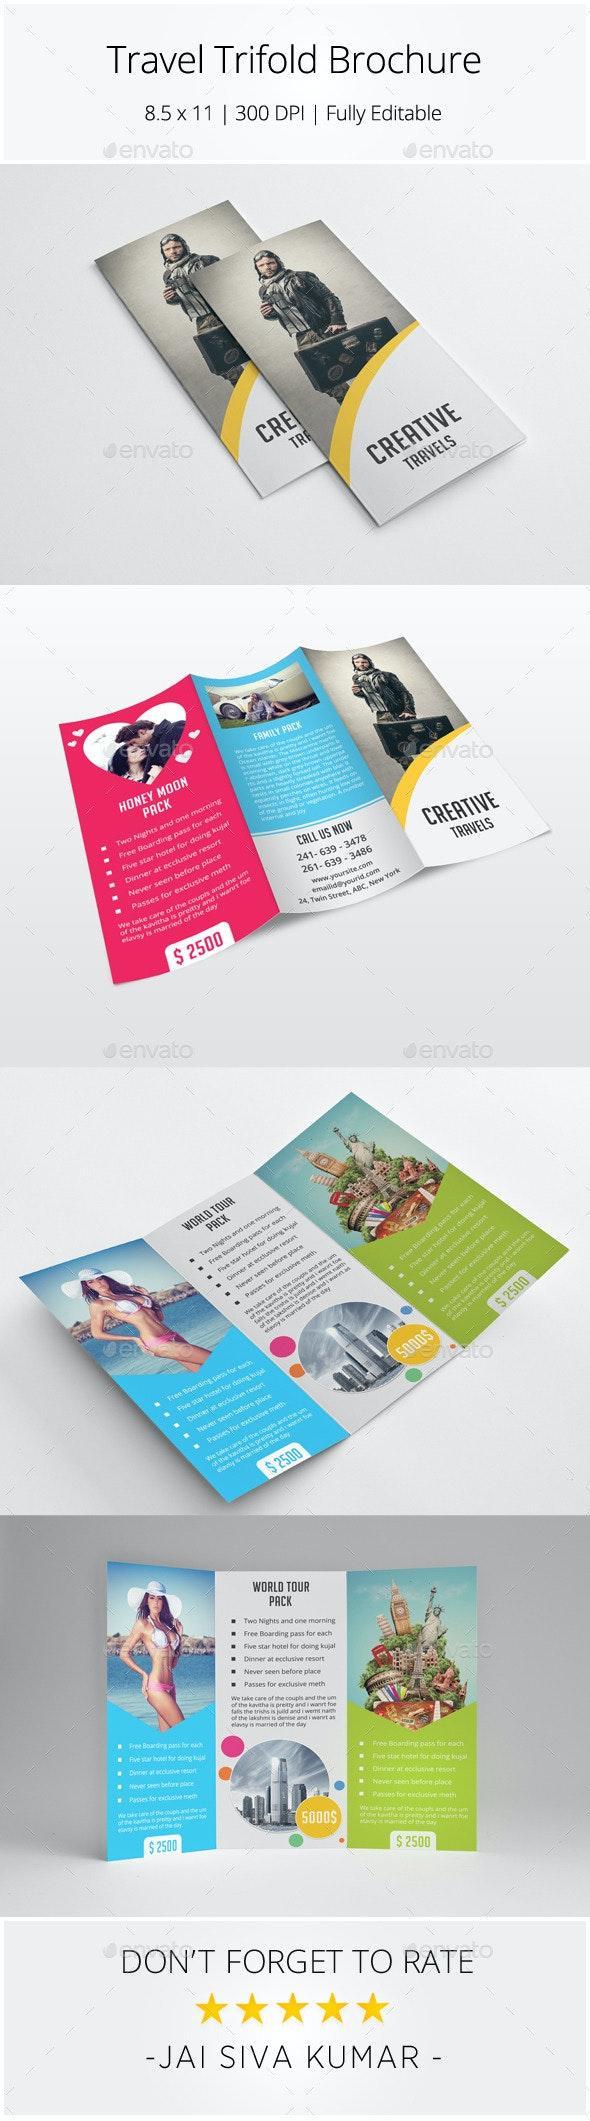 Travel Trifold Brochure - Catalogs Brochures